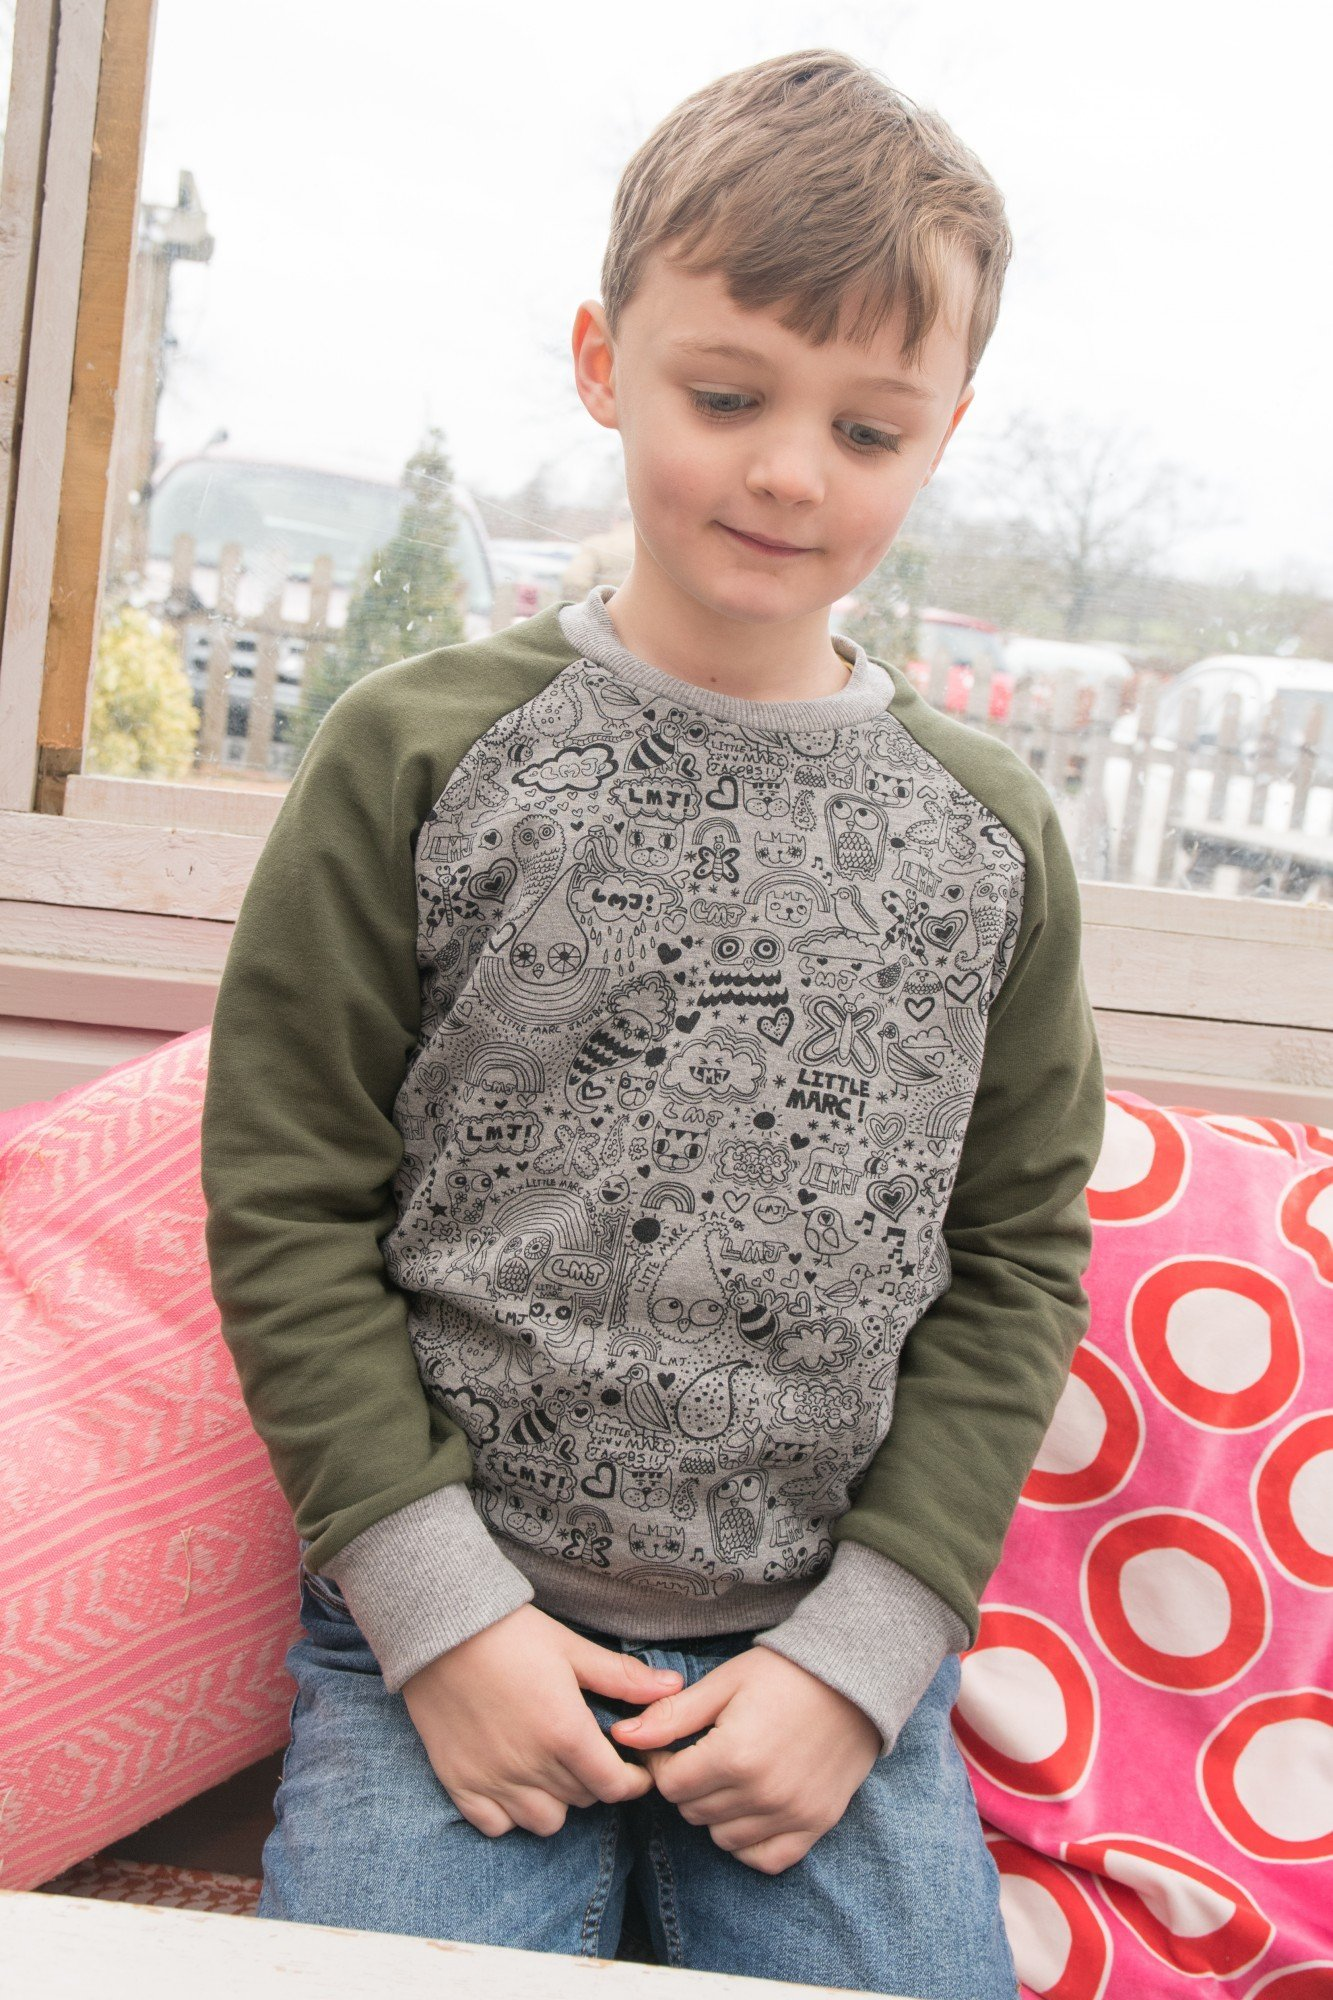 Childrens Classic Set-In Sleeves Sweatshirt Standard Kids Round Neck Sweat TOP